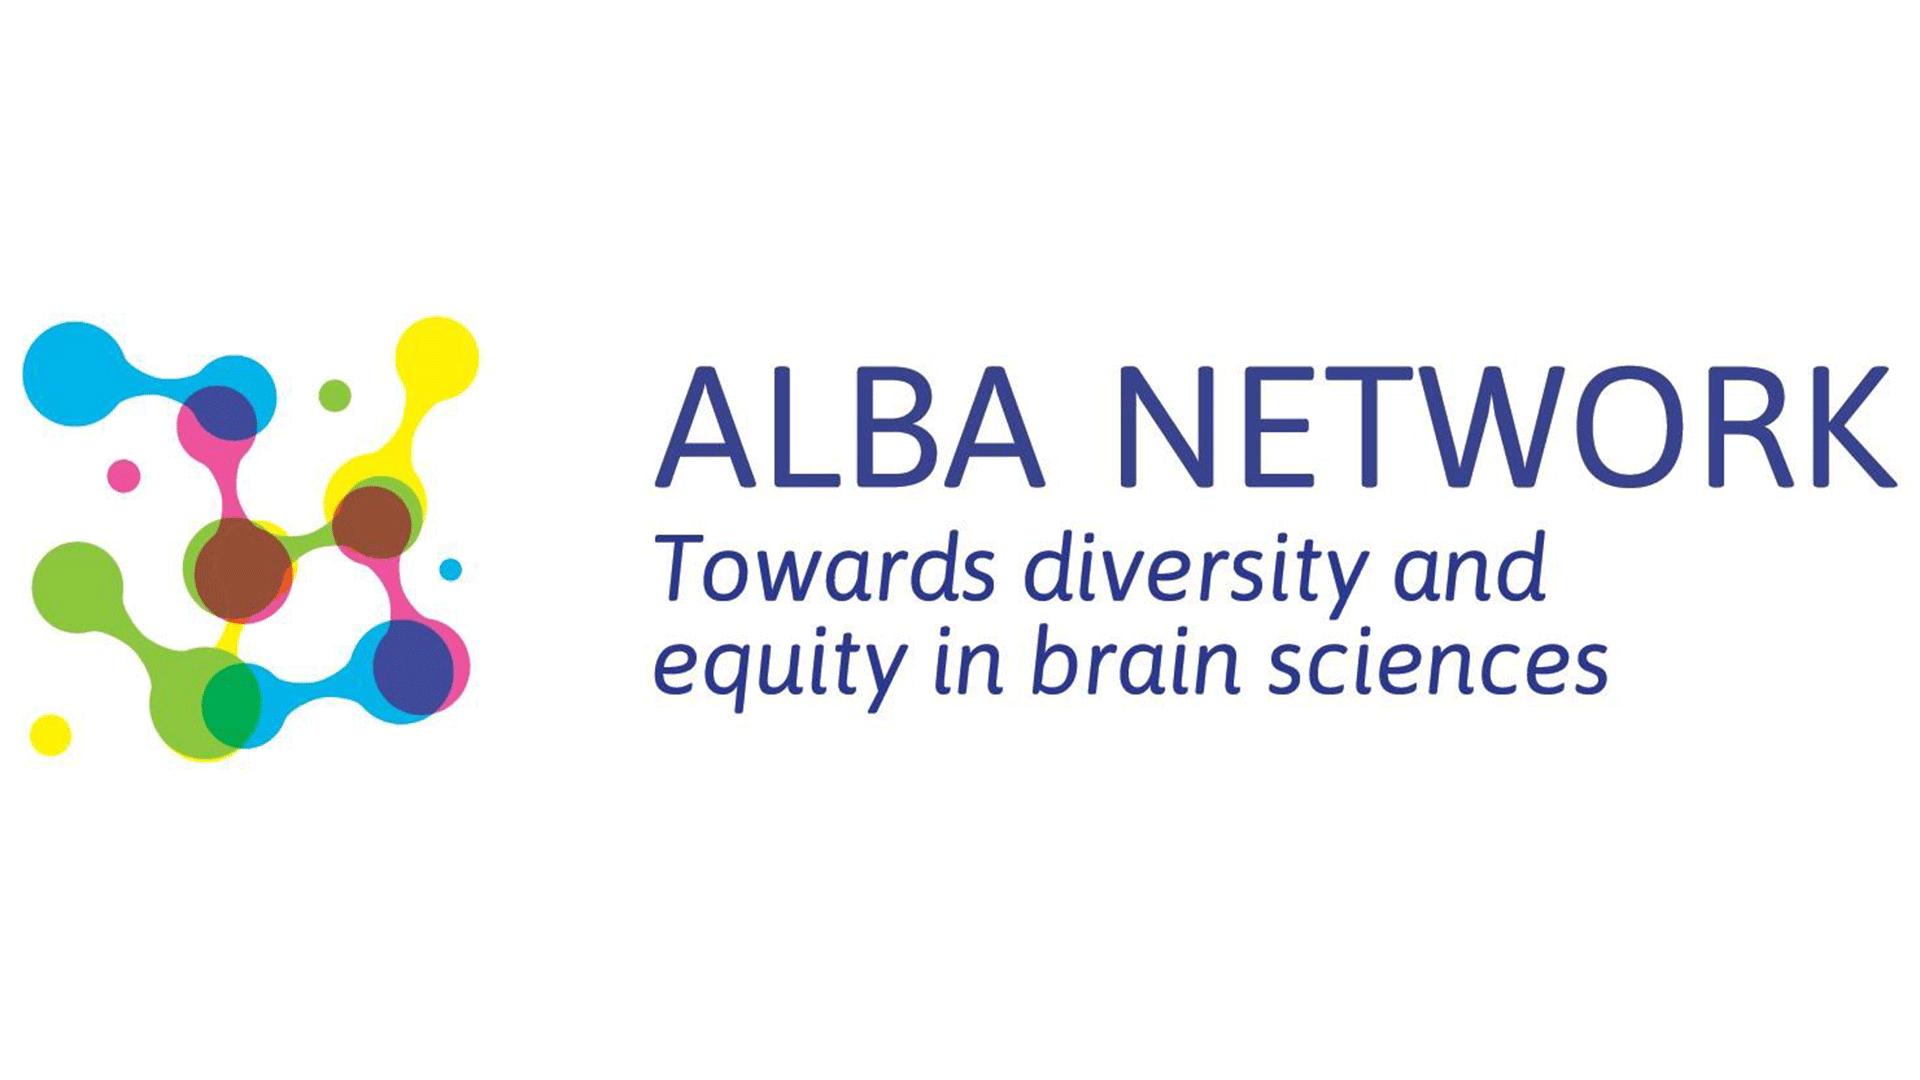 image of ALBA Network logo